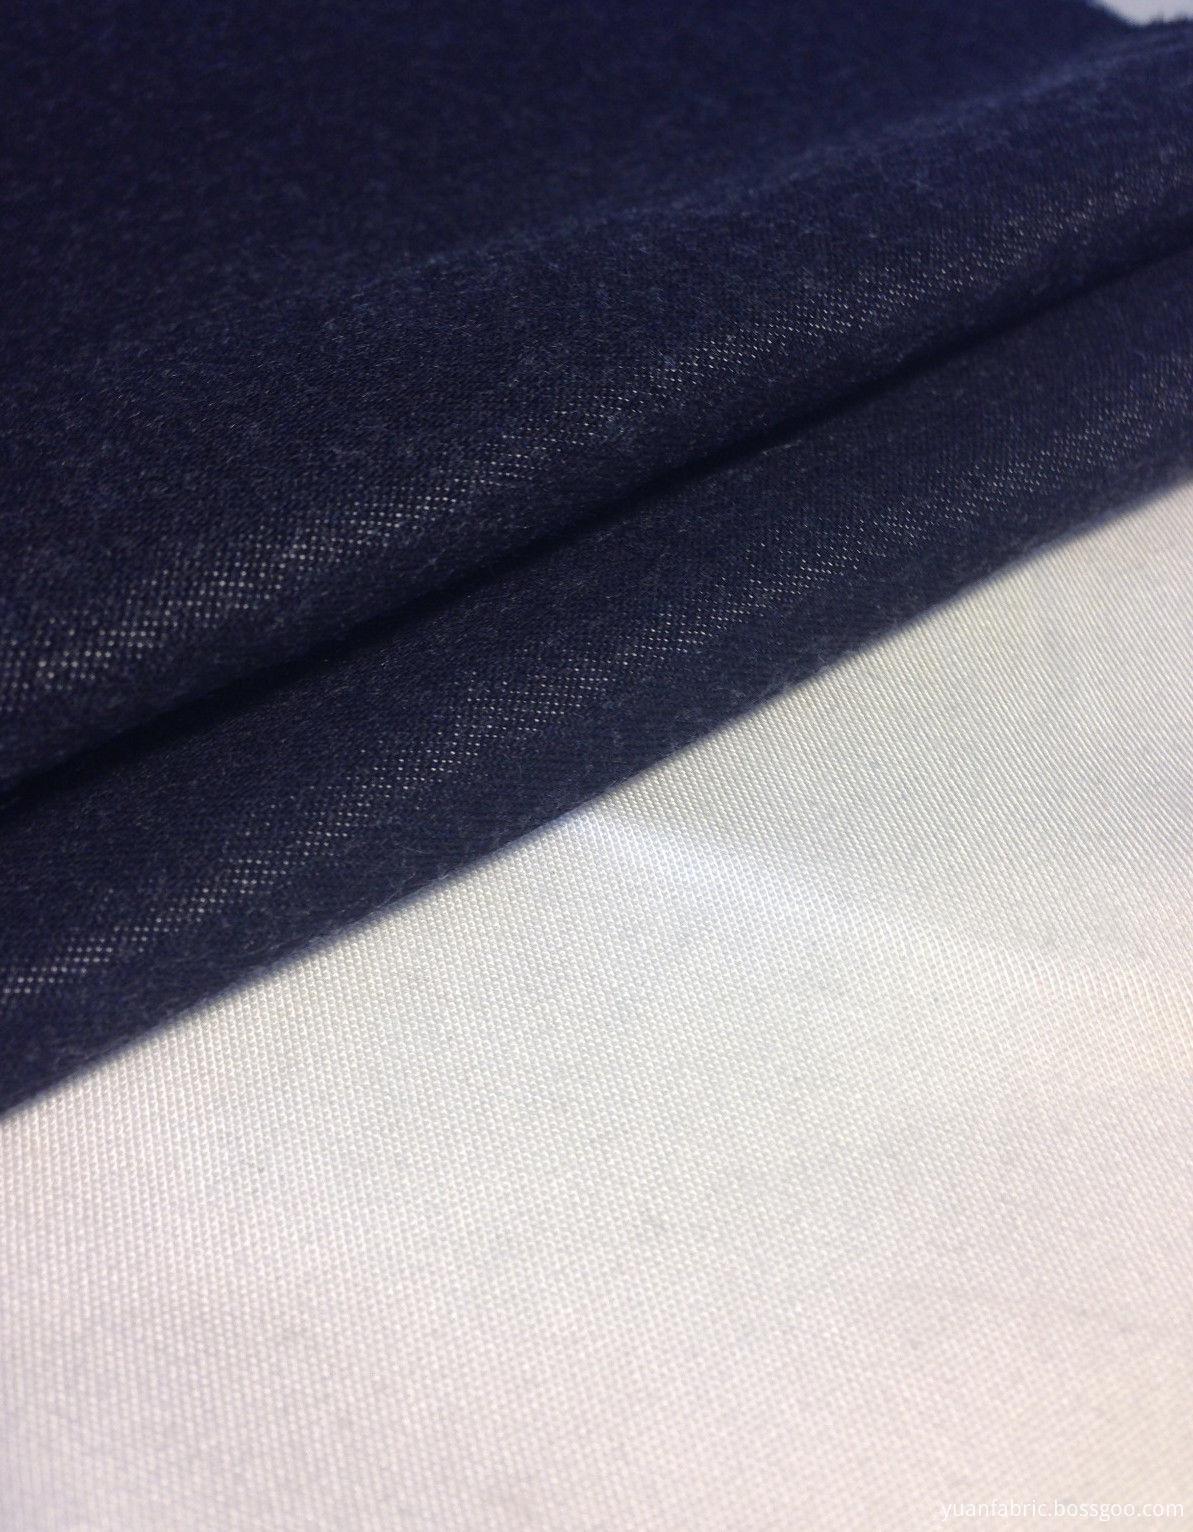 79 100 Cotton Slub Denim Jeans Fabric Stretch Denim